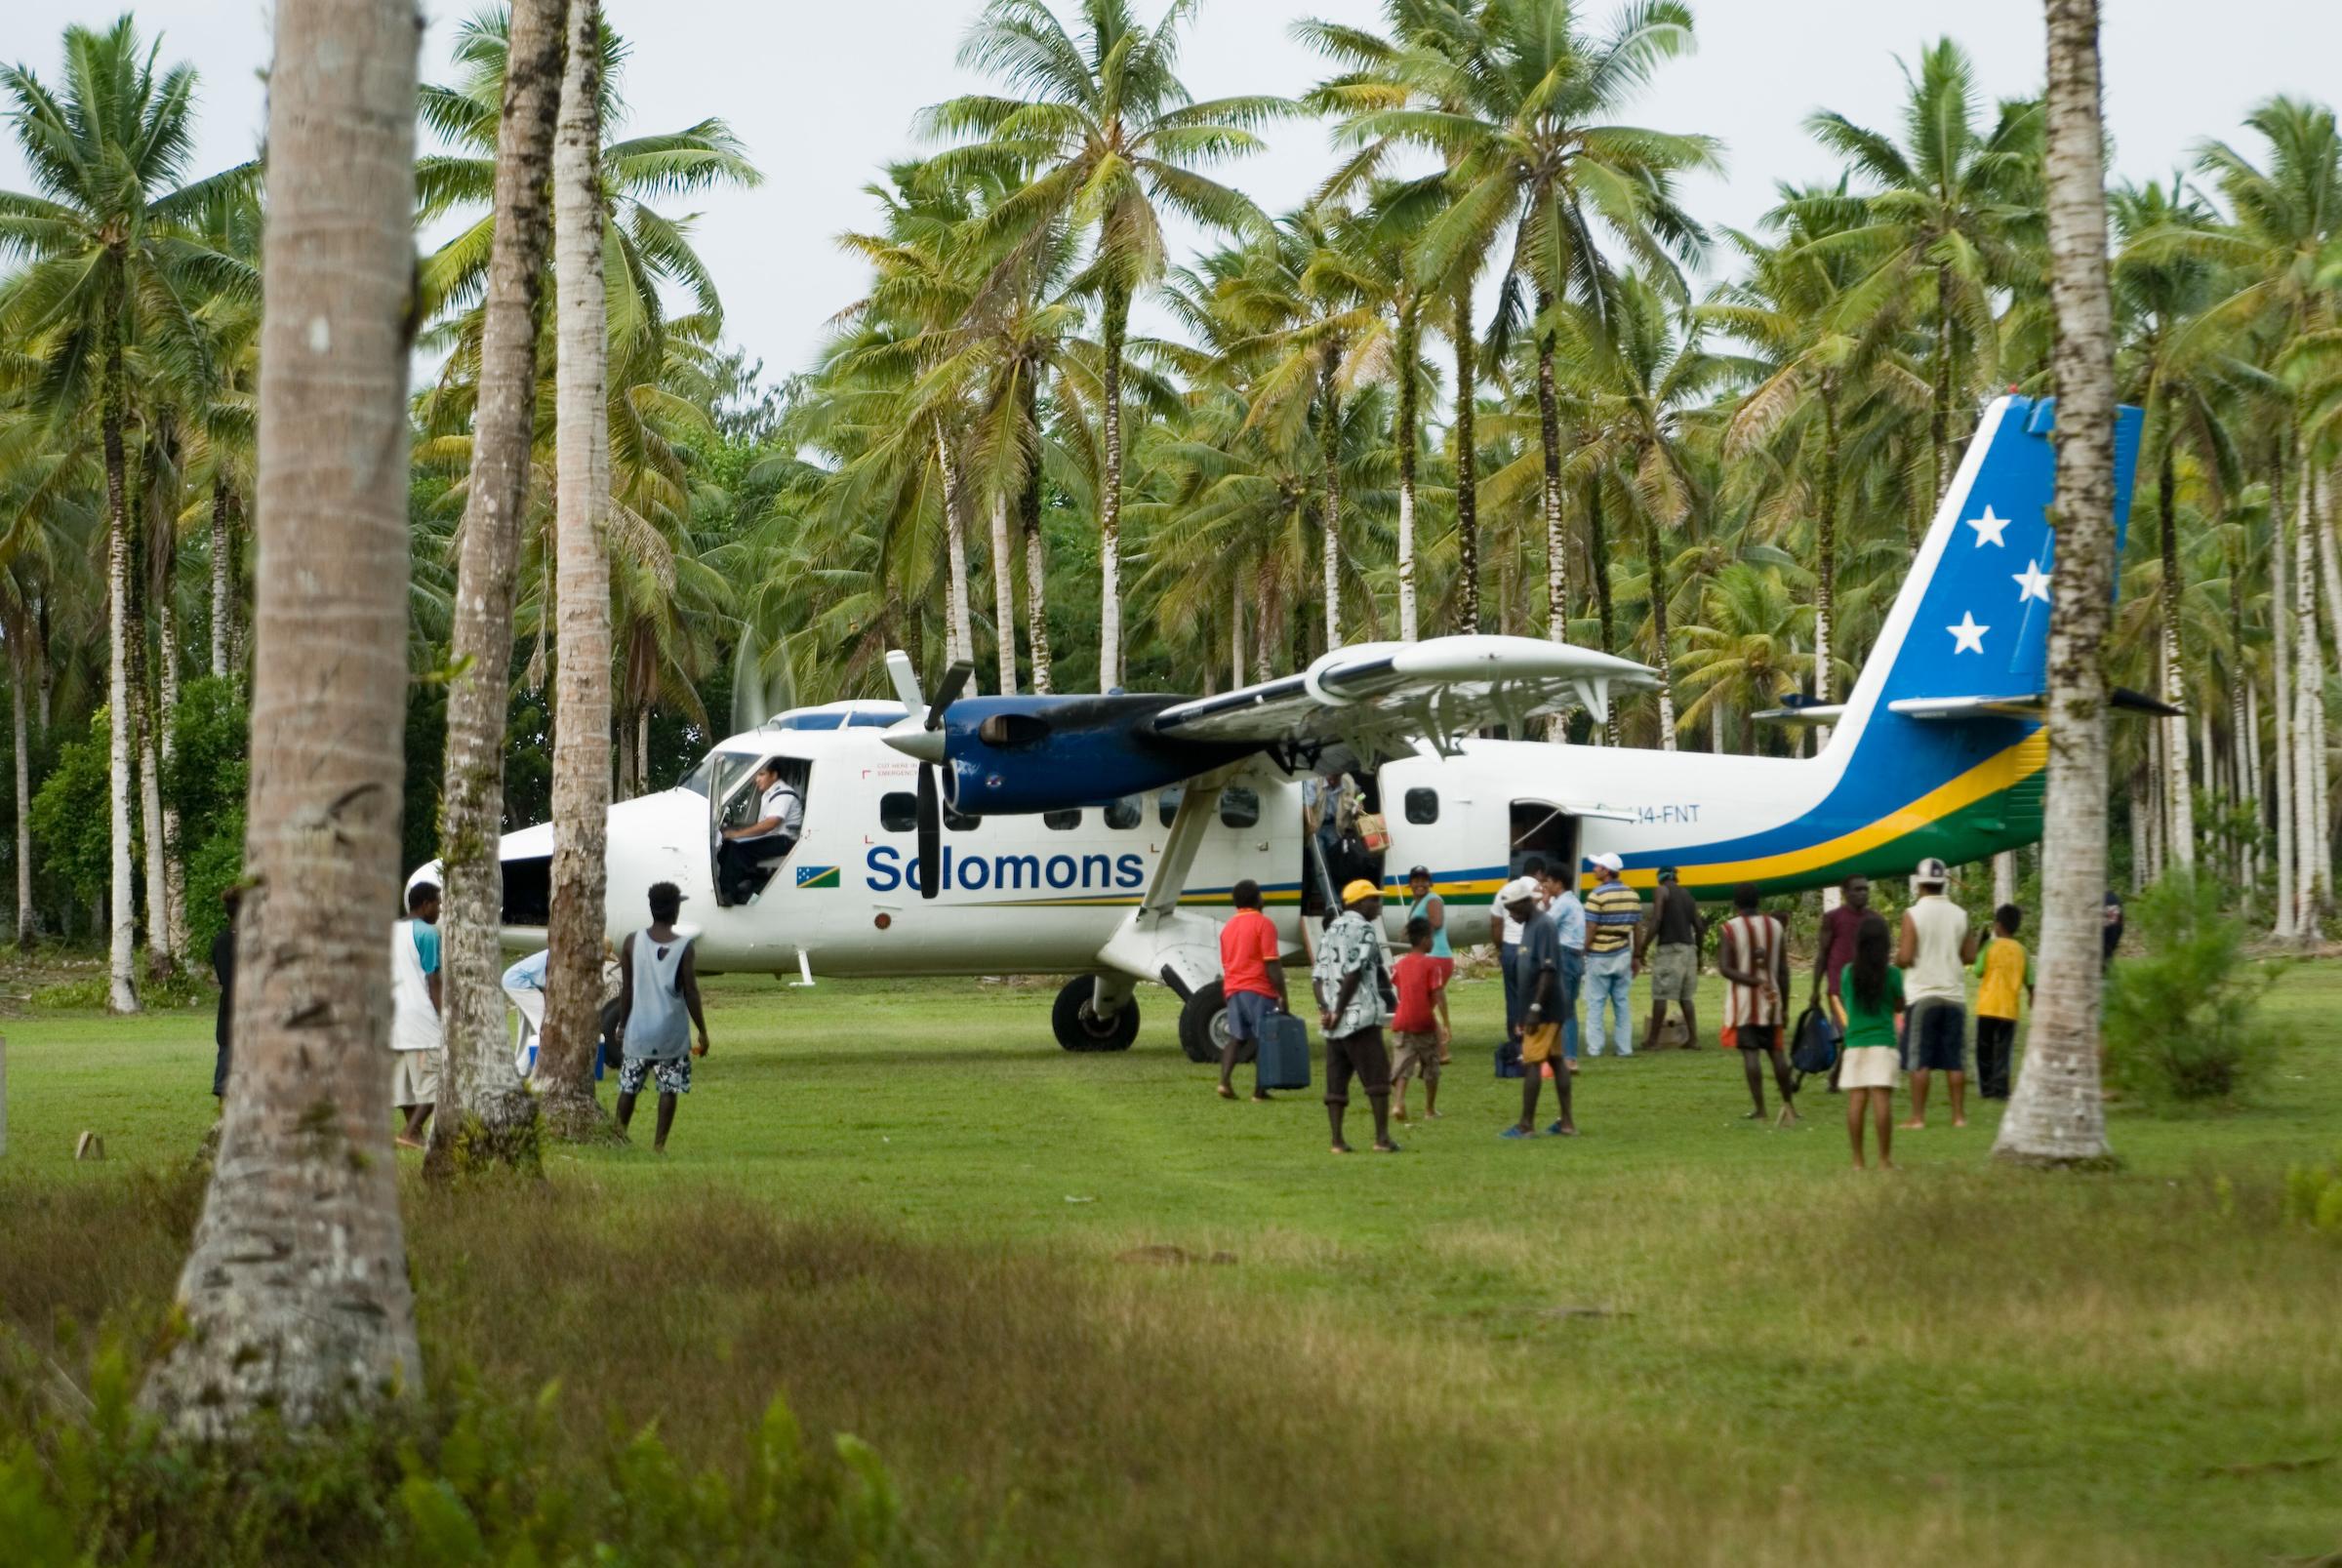 Arnavon_Islands_Solomons_067.jpg